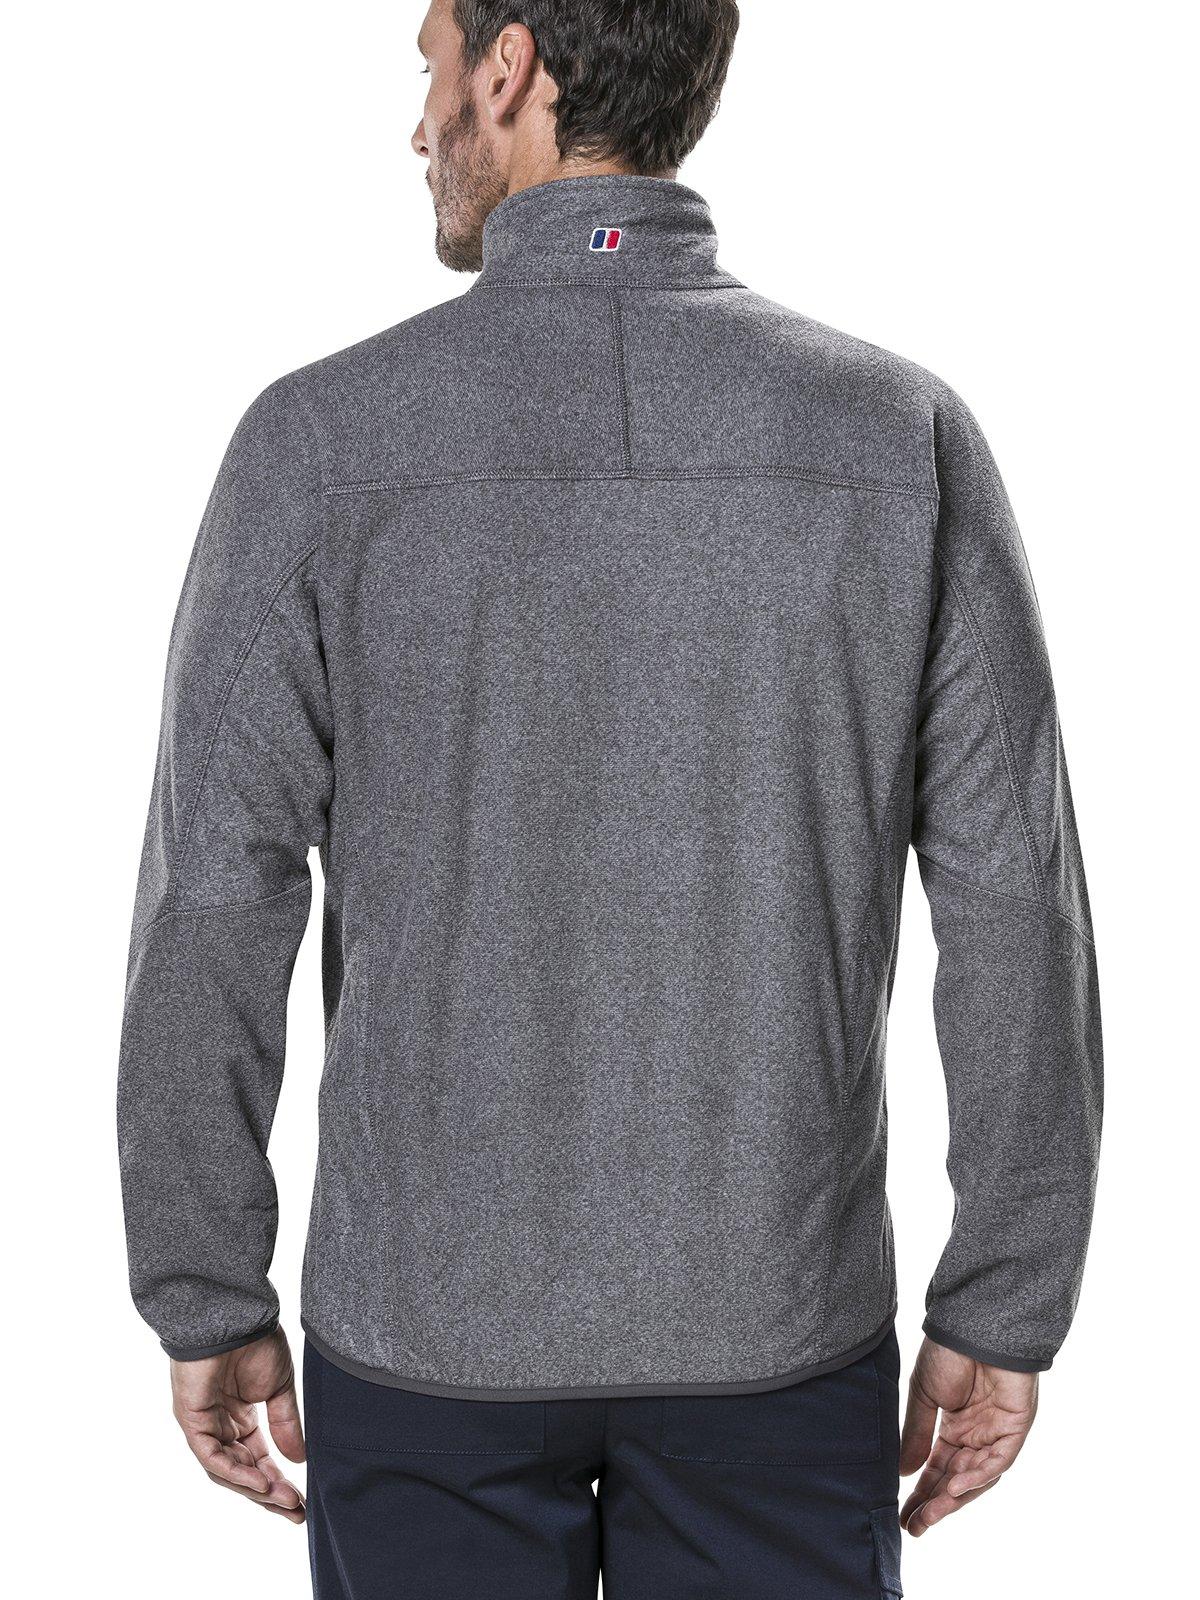 Berghaus Mens Spectrum Micro 2.0 Full Zip Fleece Jacket 3